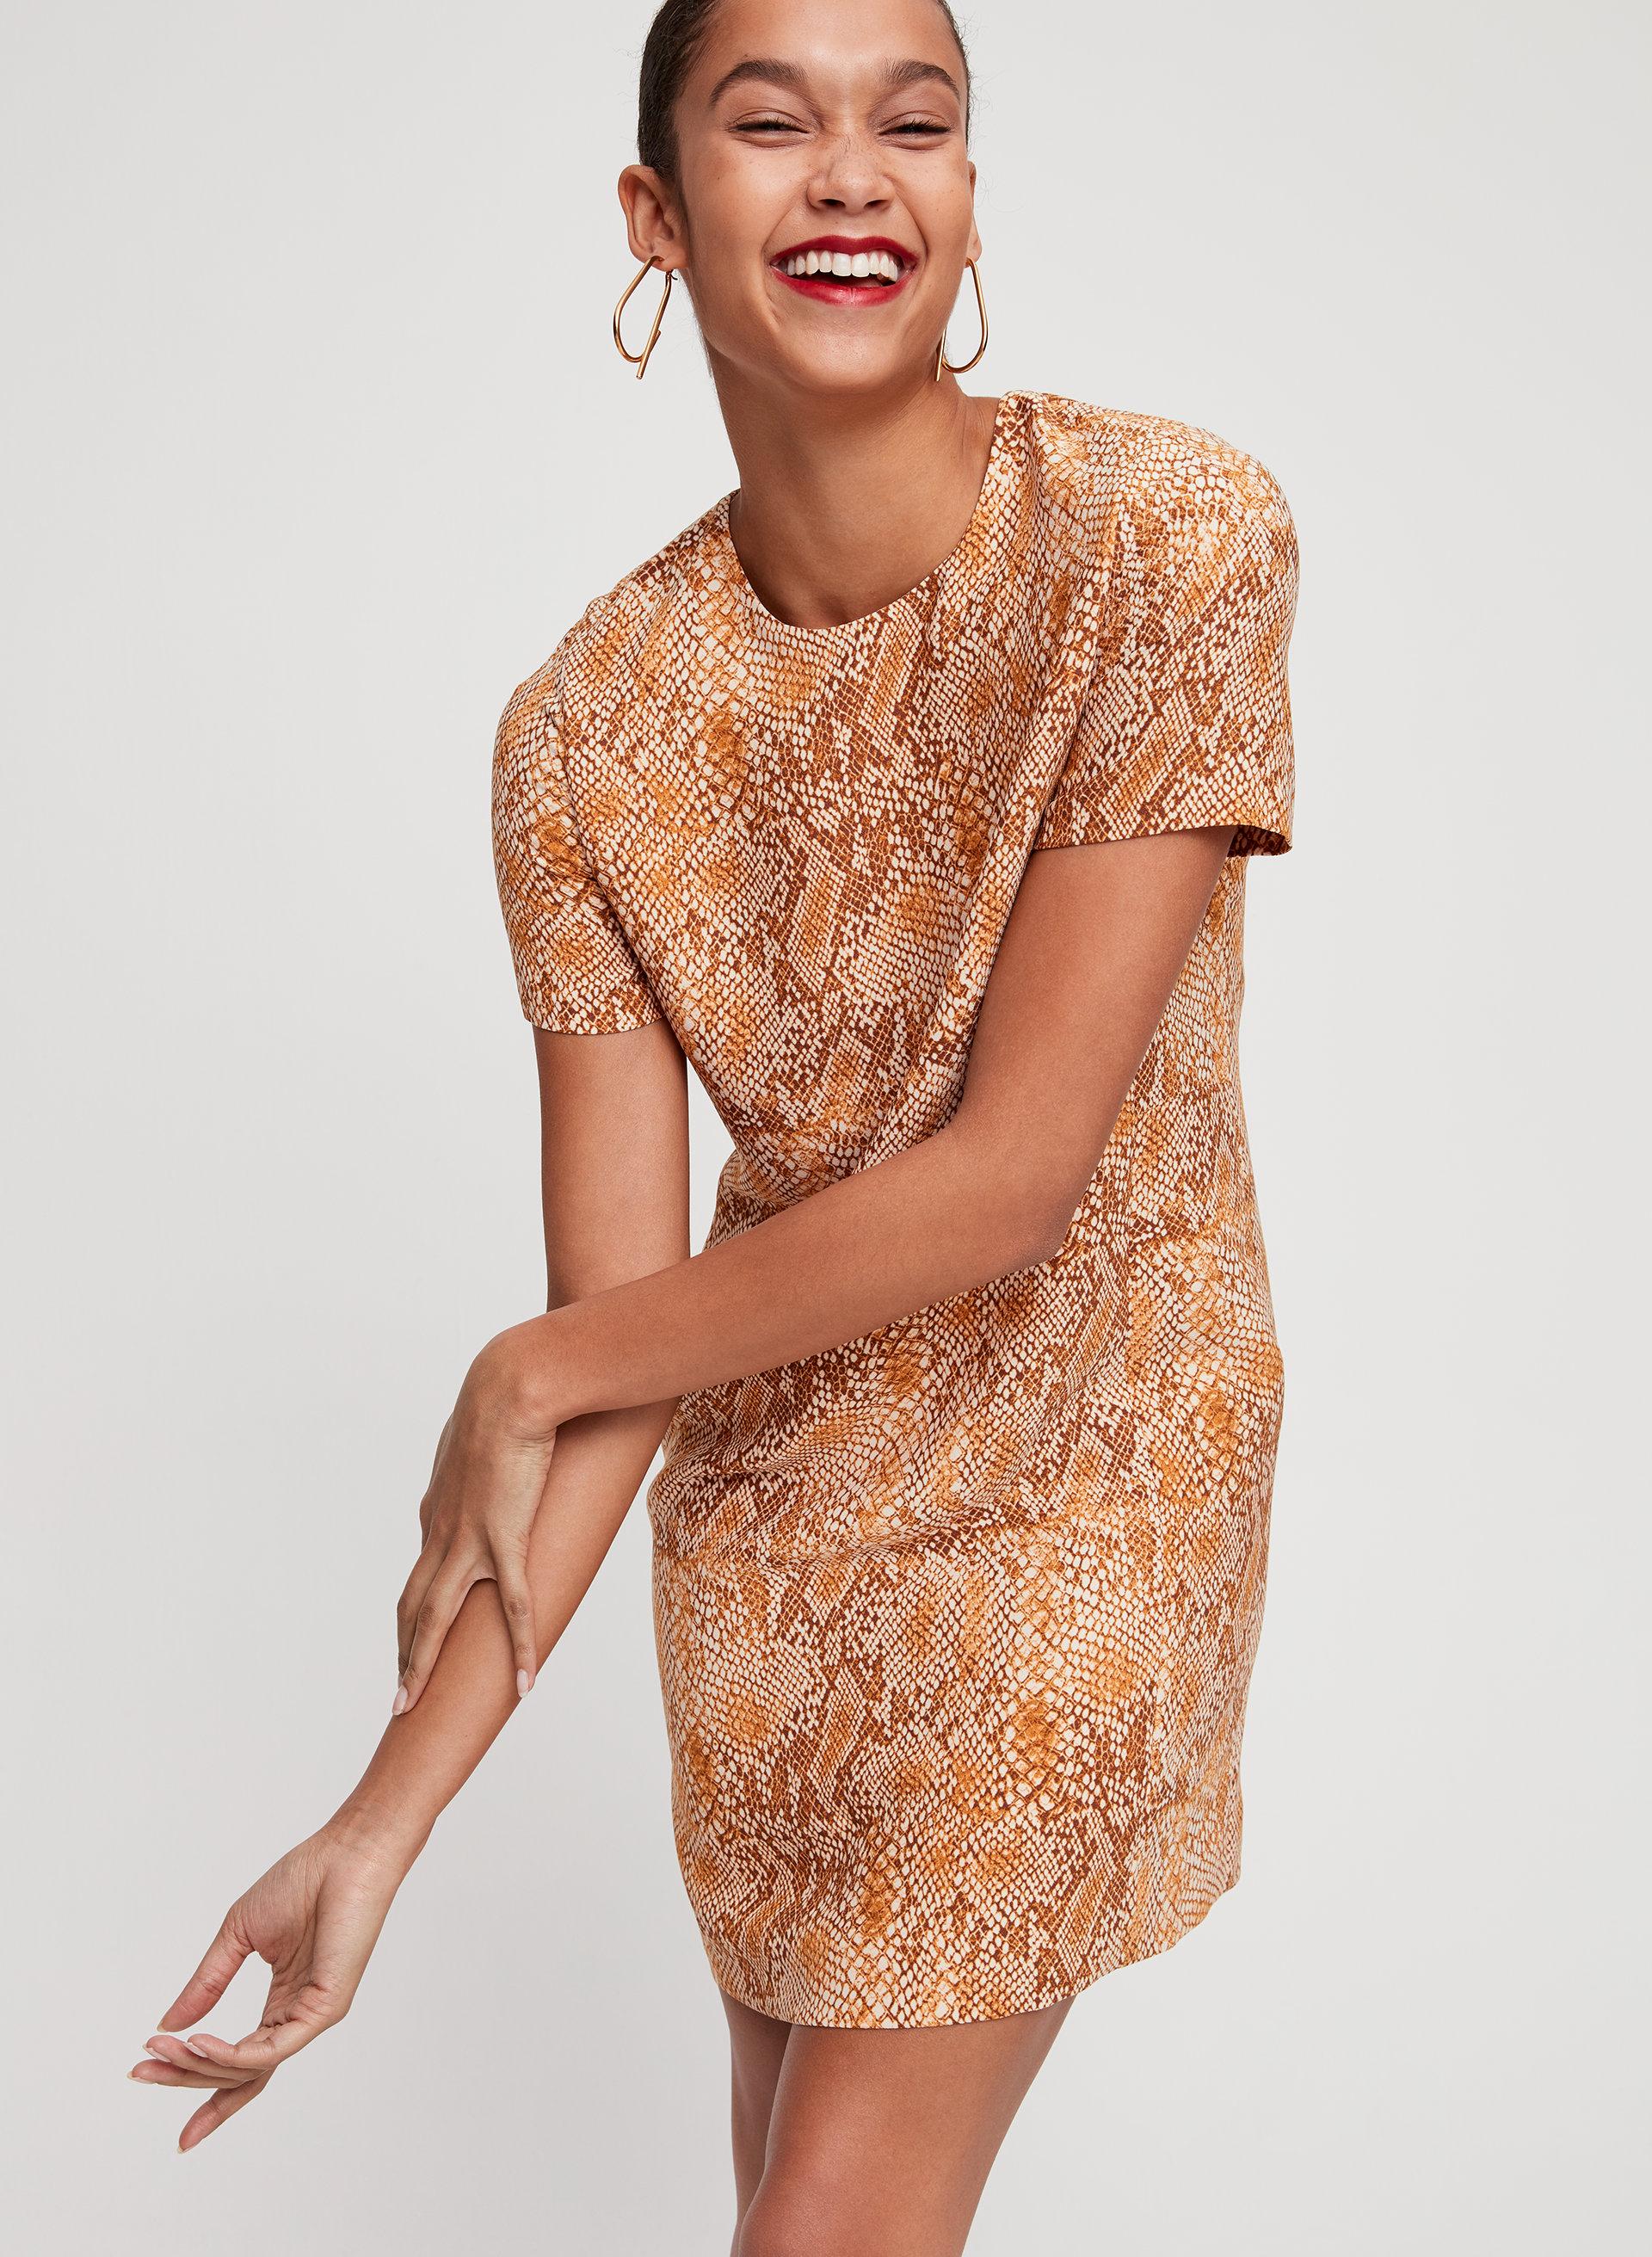 3100755495 patricio dress Short-sleeve, snake print dress